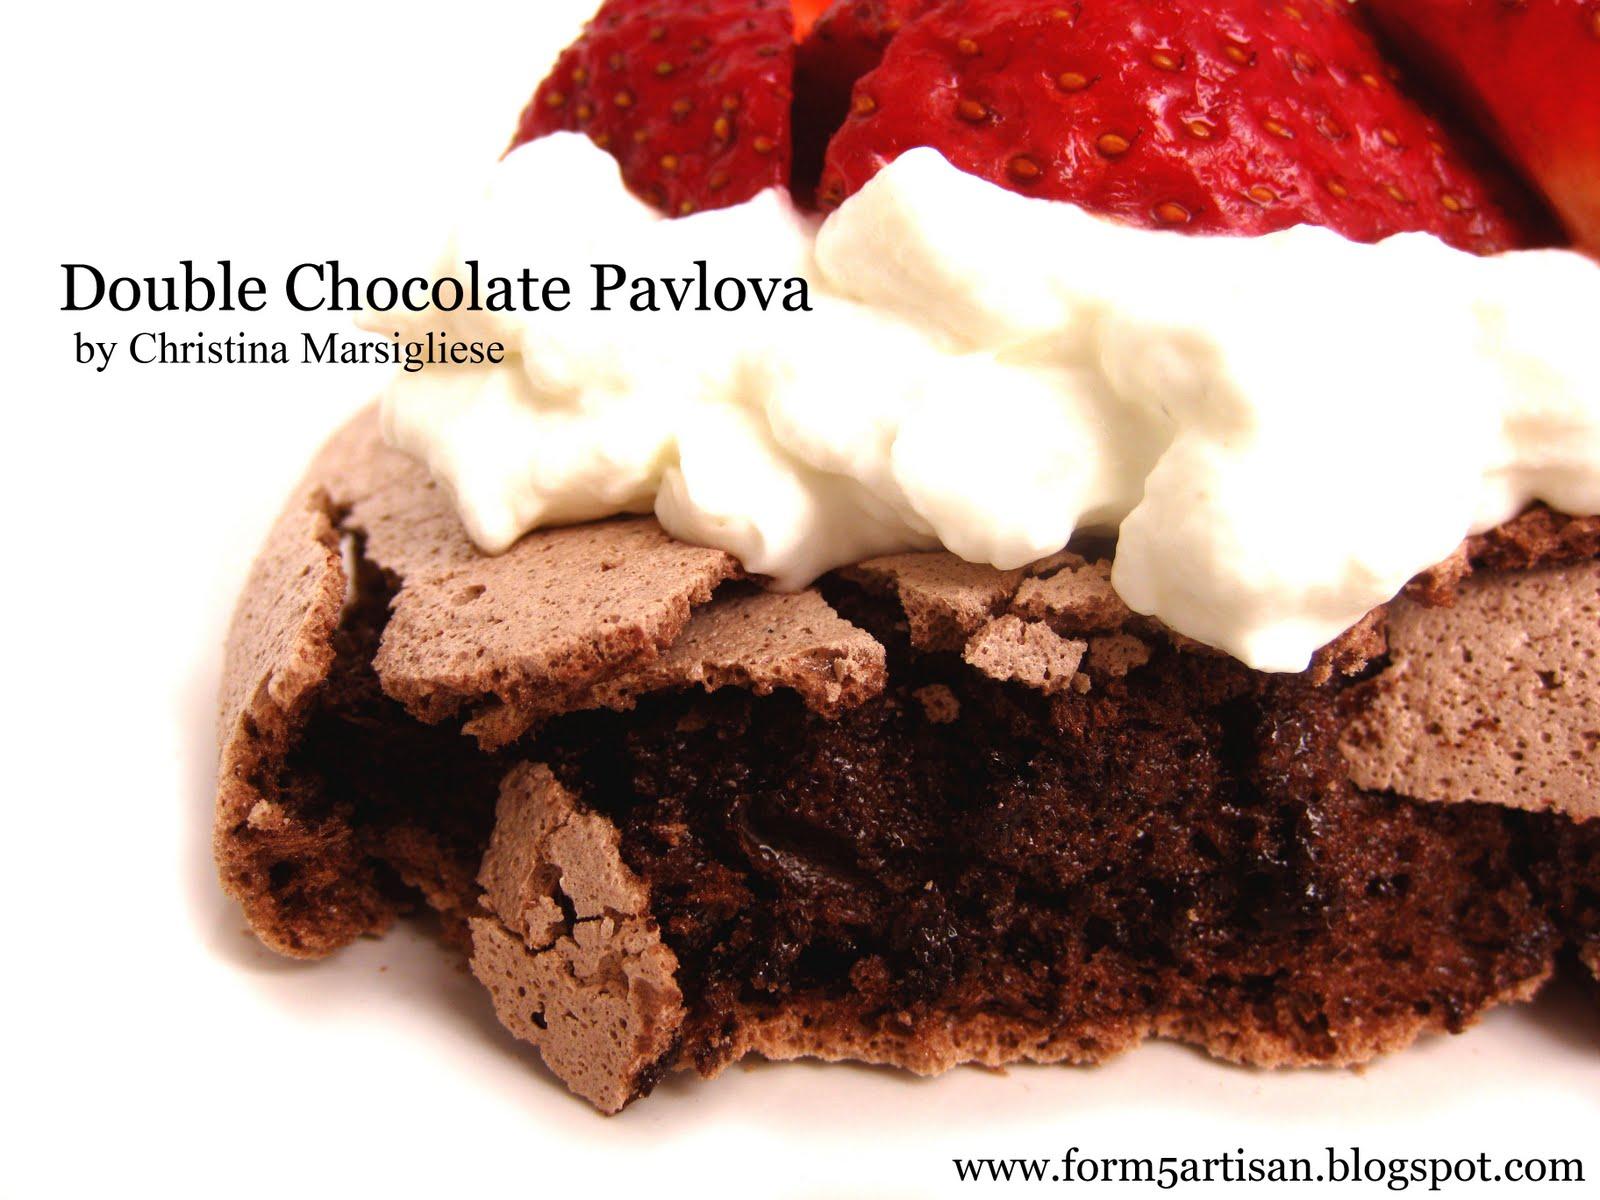 Double Chocolate Pavlova